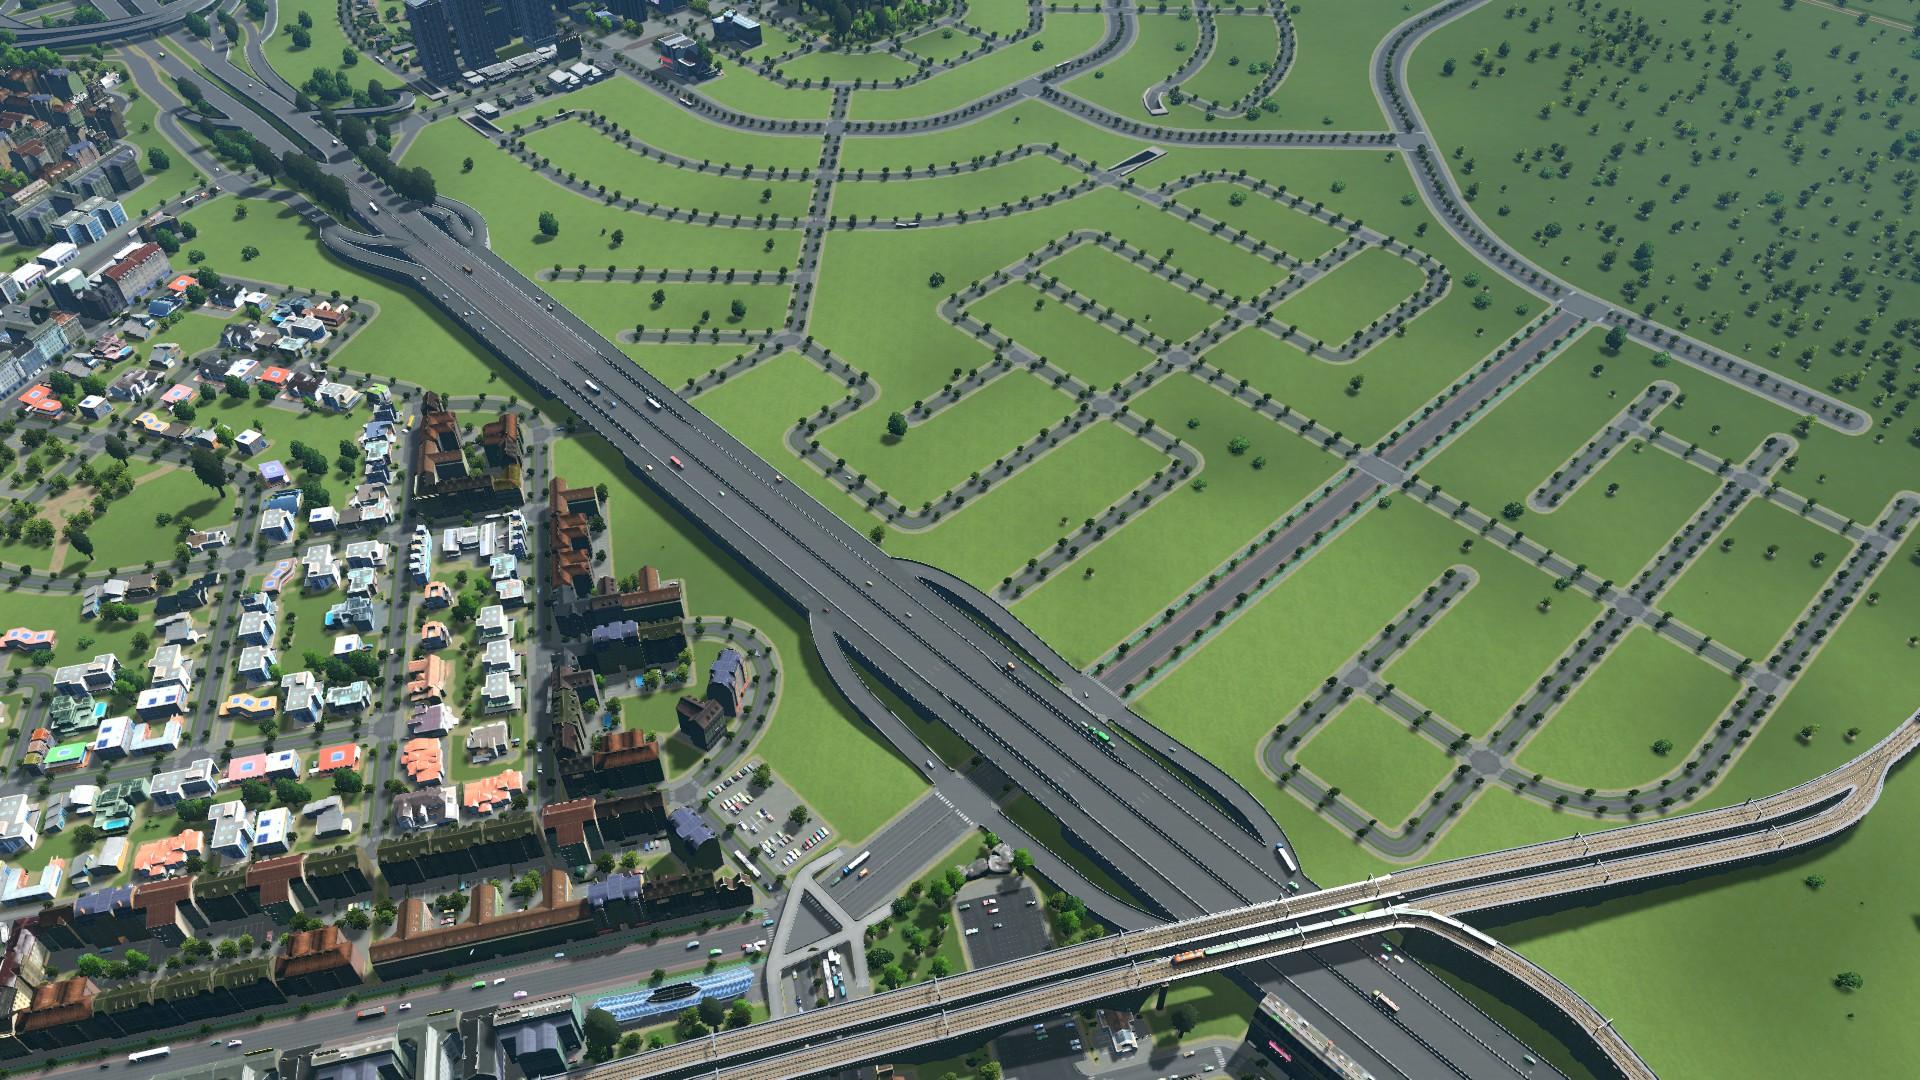 http://thuis.tunaweb.nl/skylines/20180511010142_1.jpg